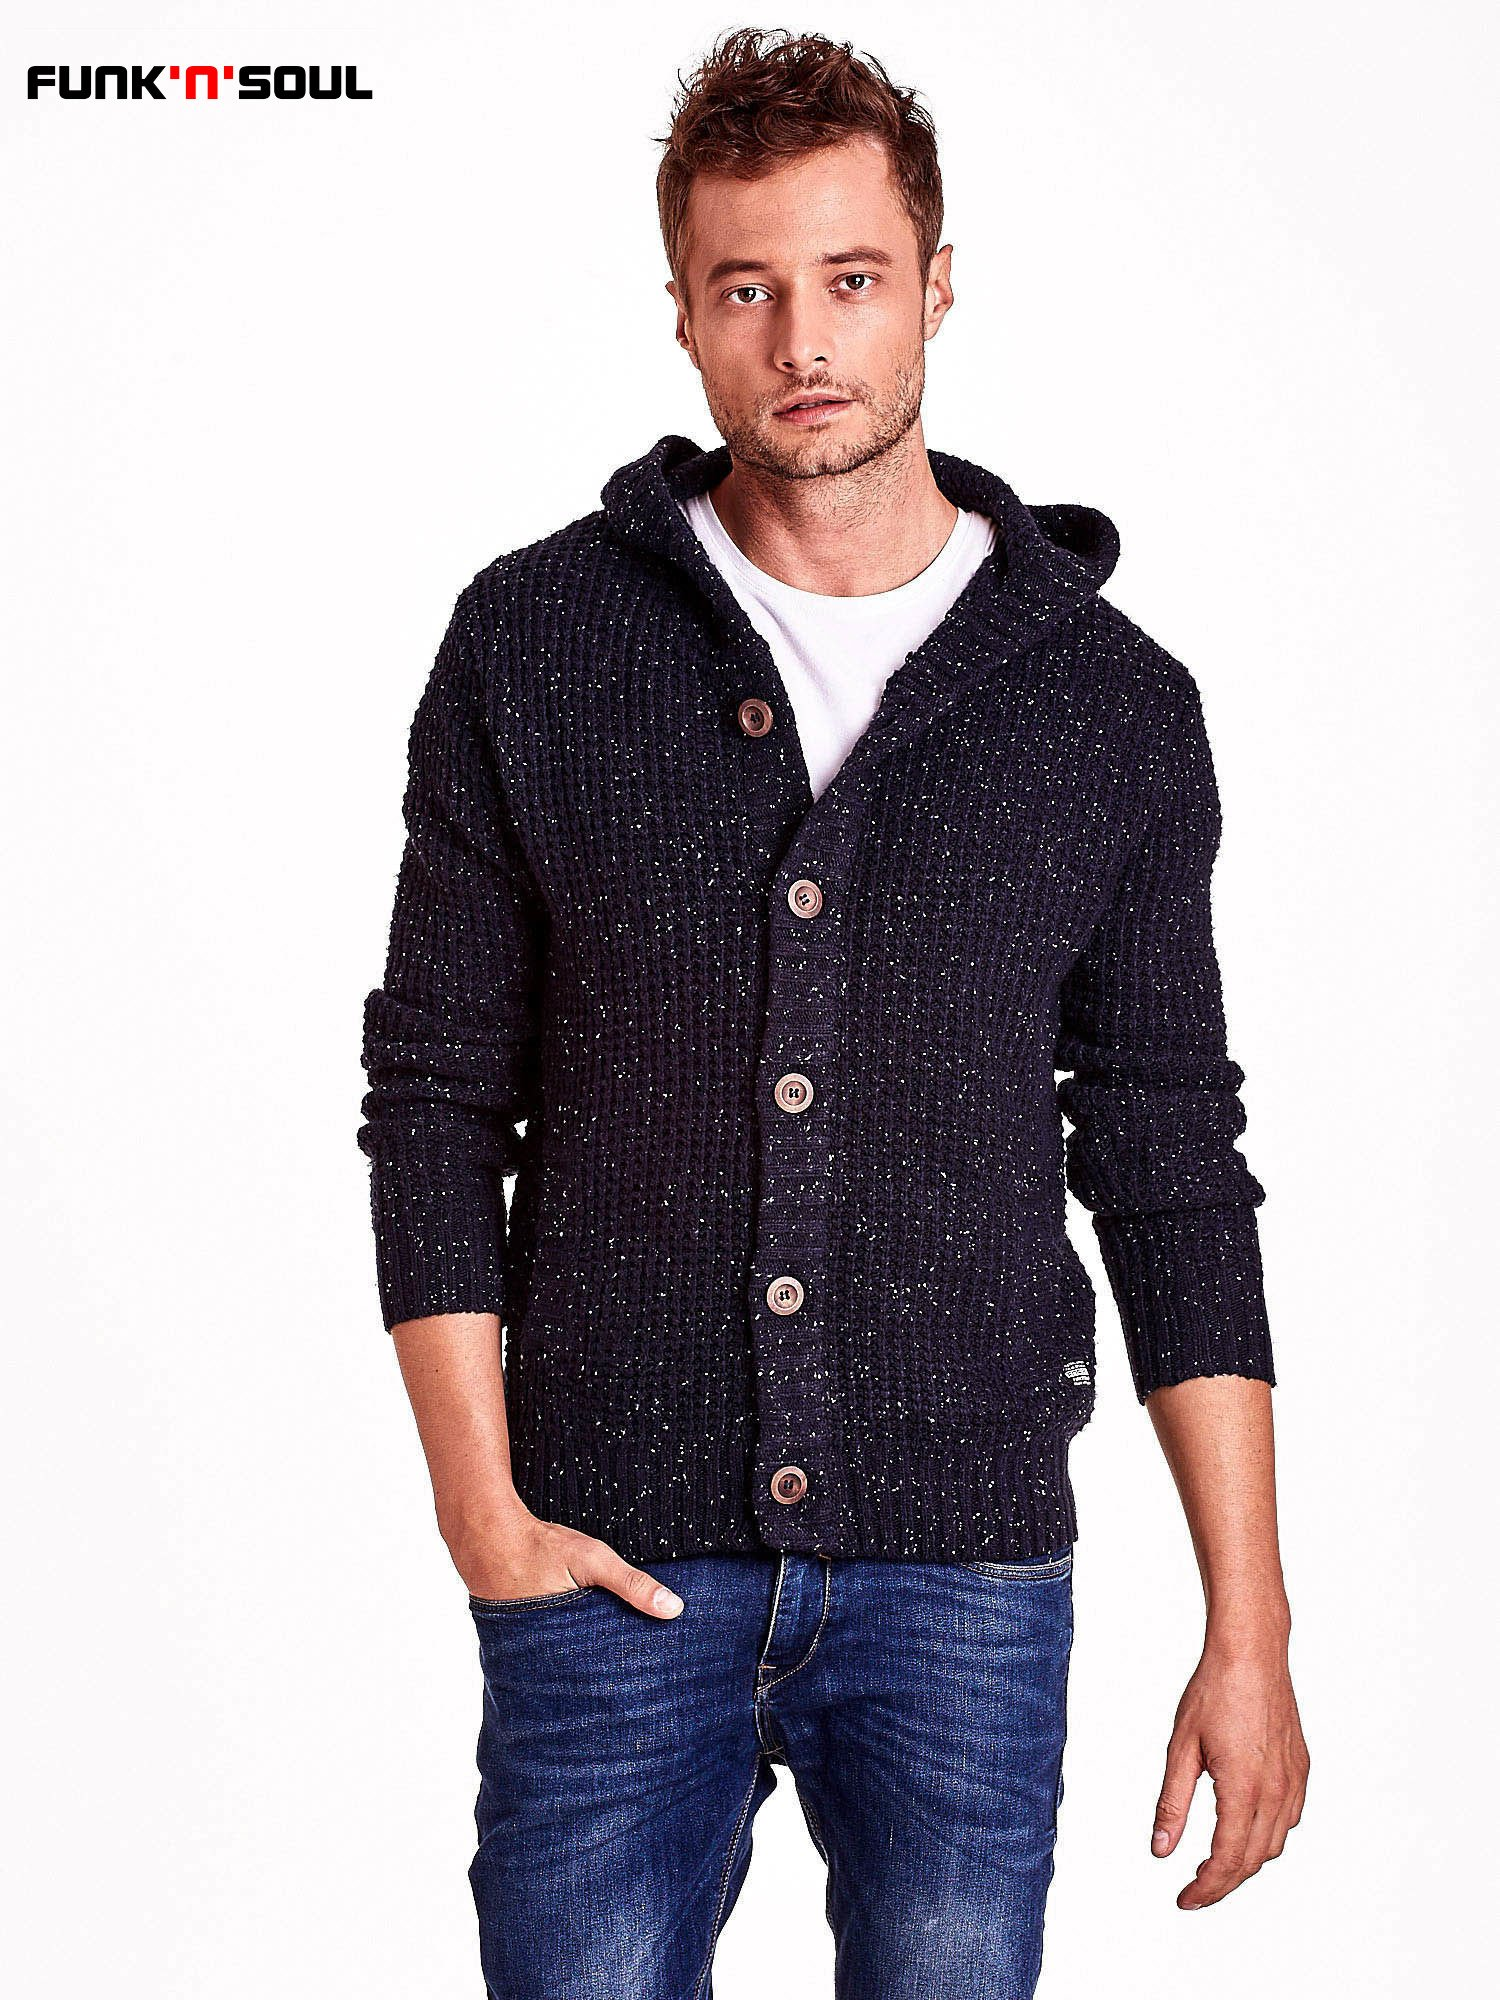 Granatowy sweter męski z kapturem FUNK N SOUL                                  zdj.                                  2